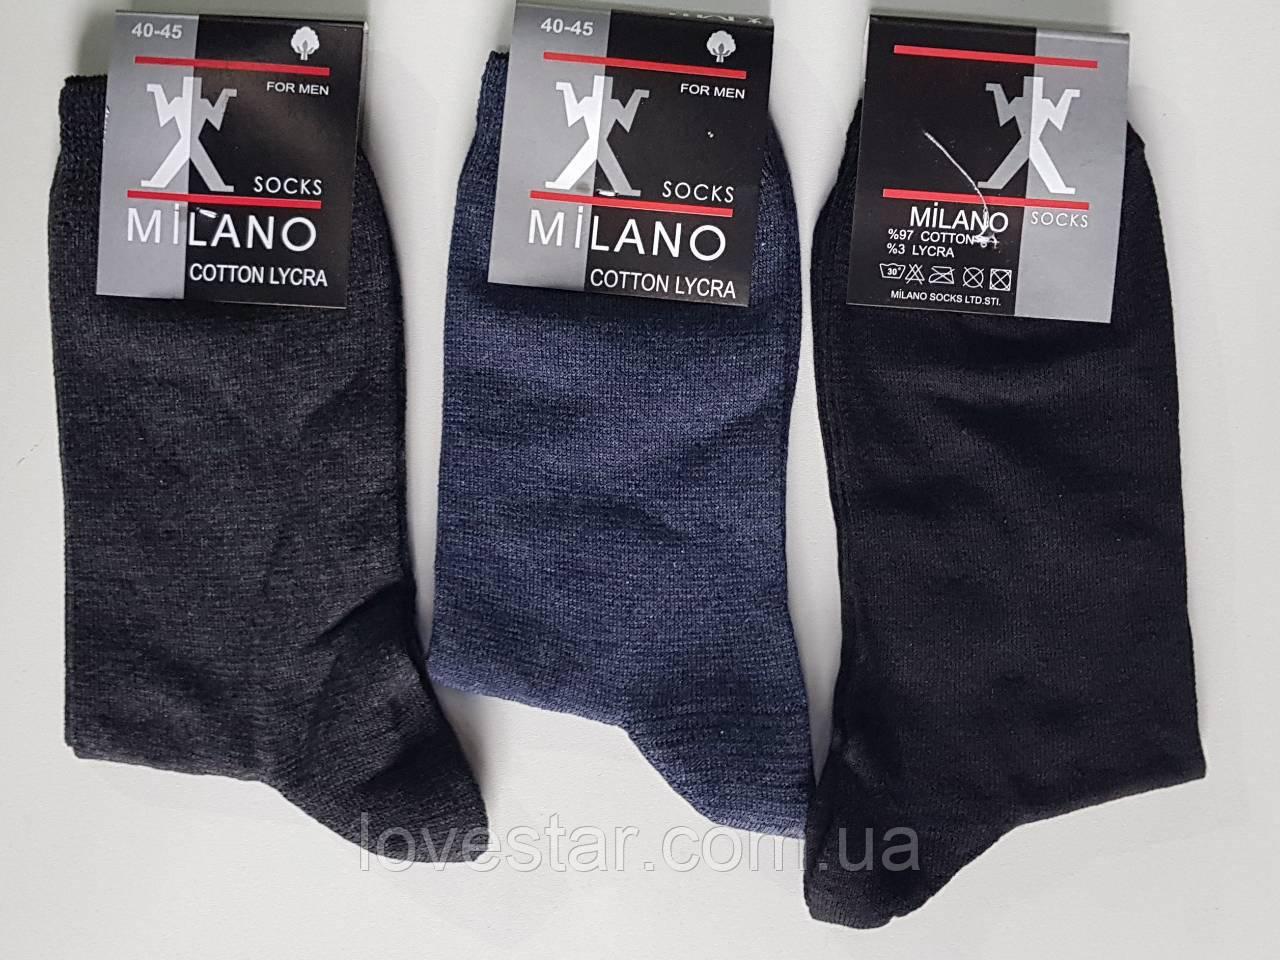 Мужские носки мужские стрейч Милано размер (40-45) Темный микс